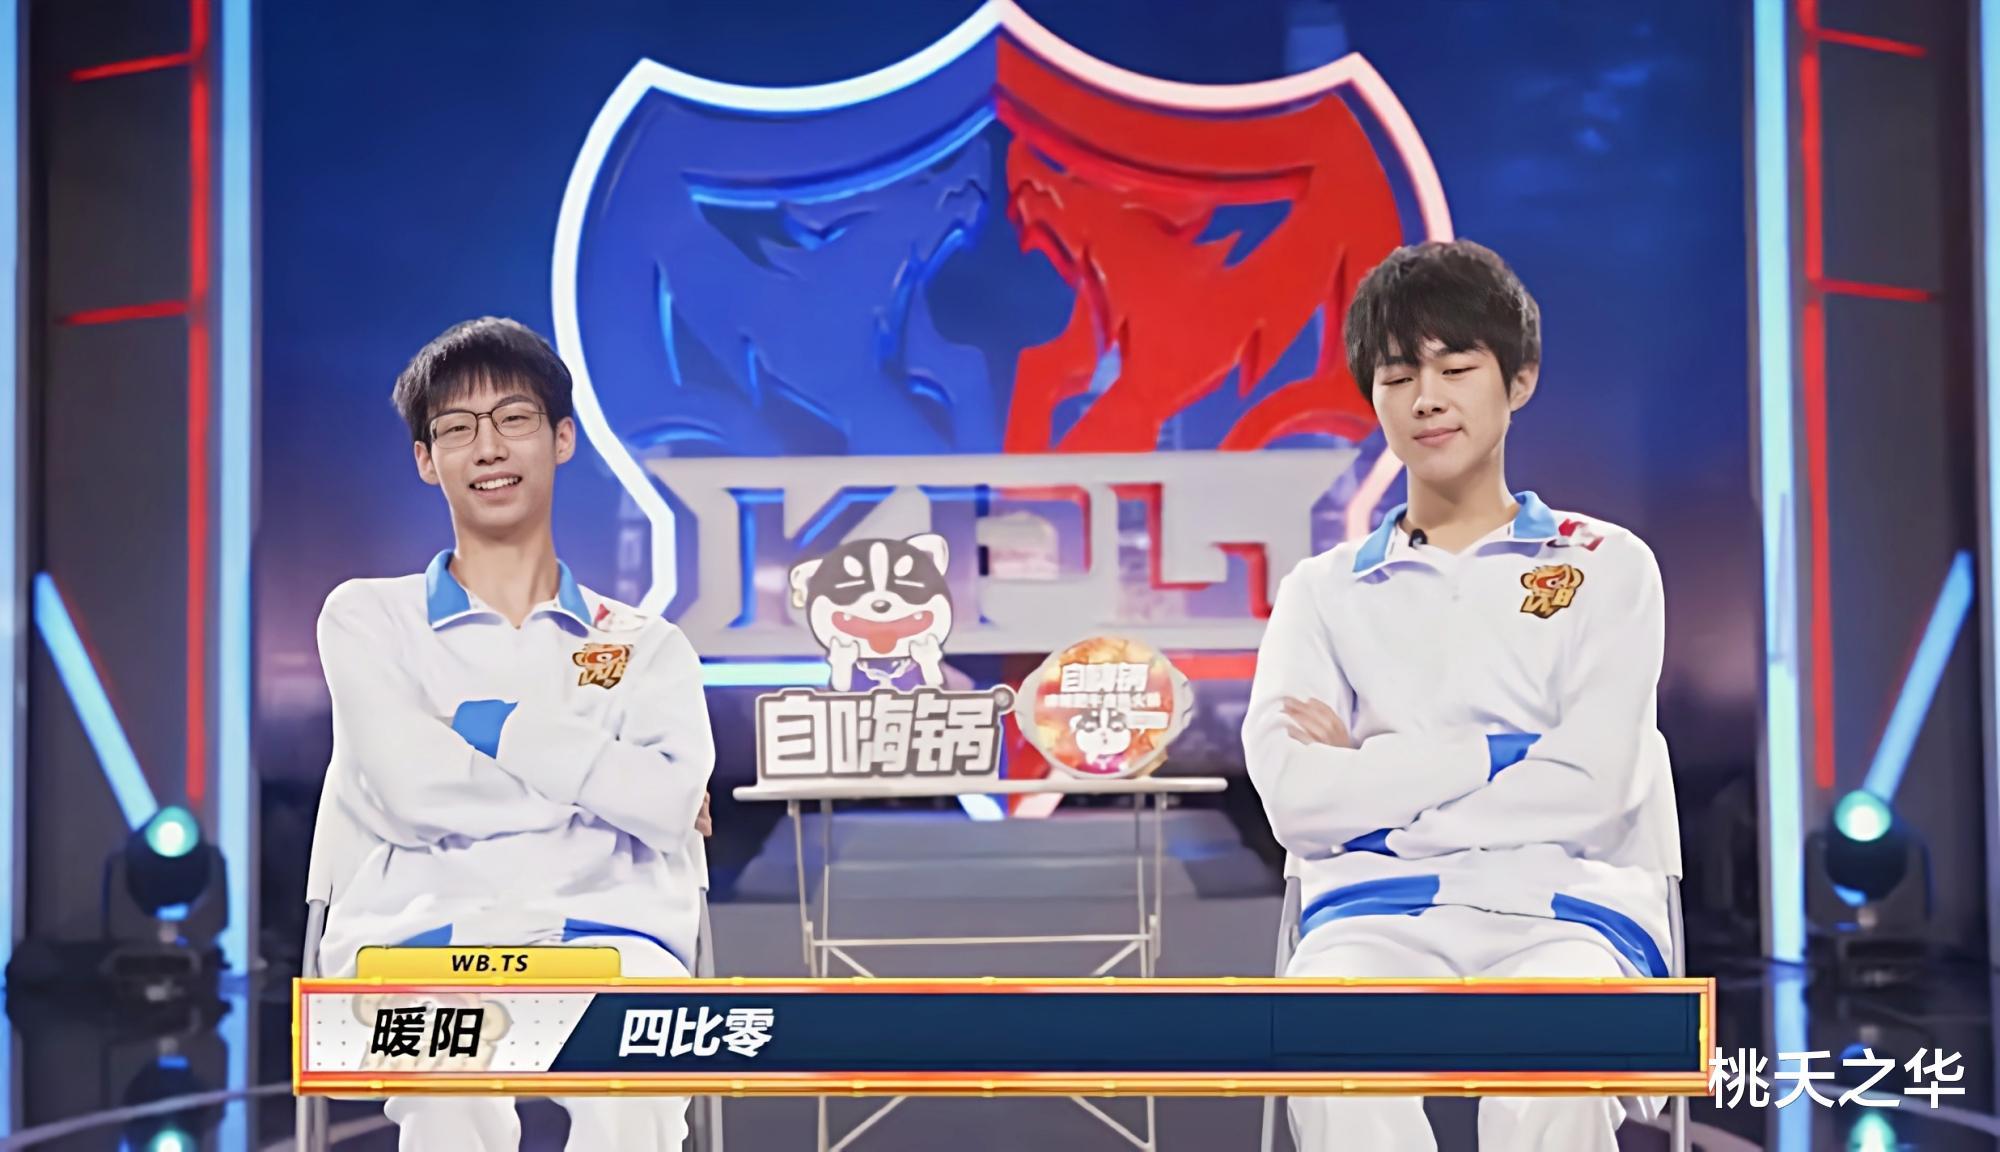 AG超玩会与DYG总决赛预测,AG超玩会夺冠几率为零,反向毒奶?